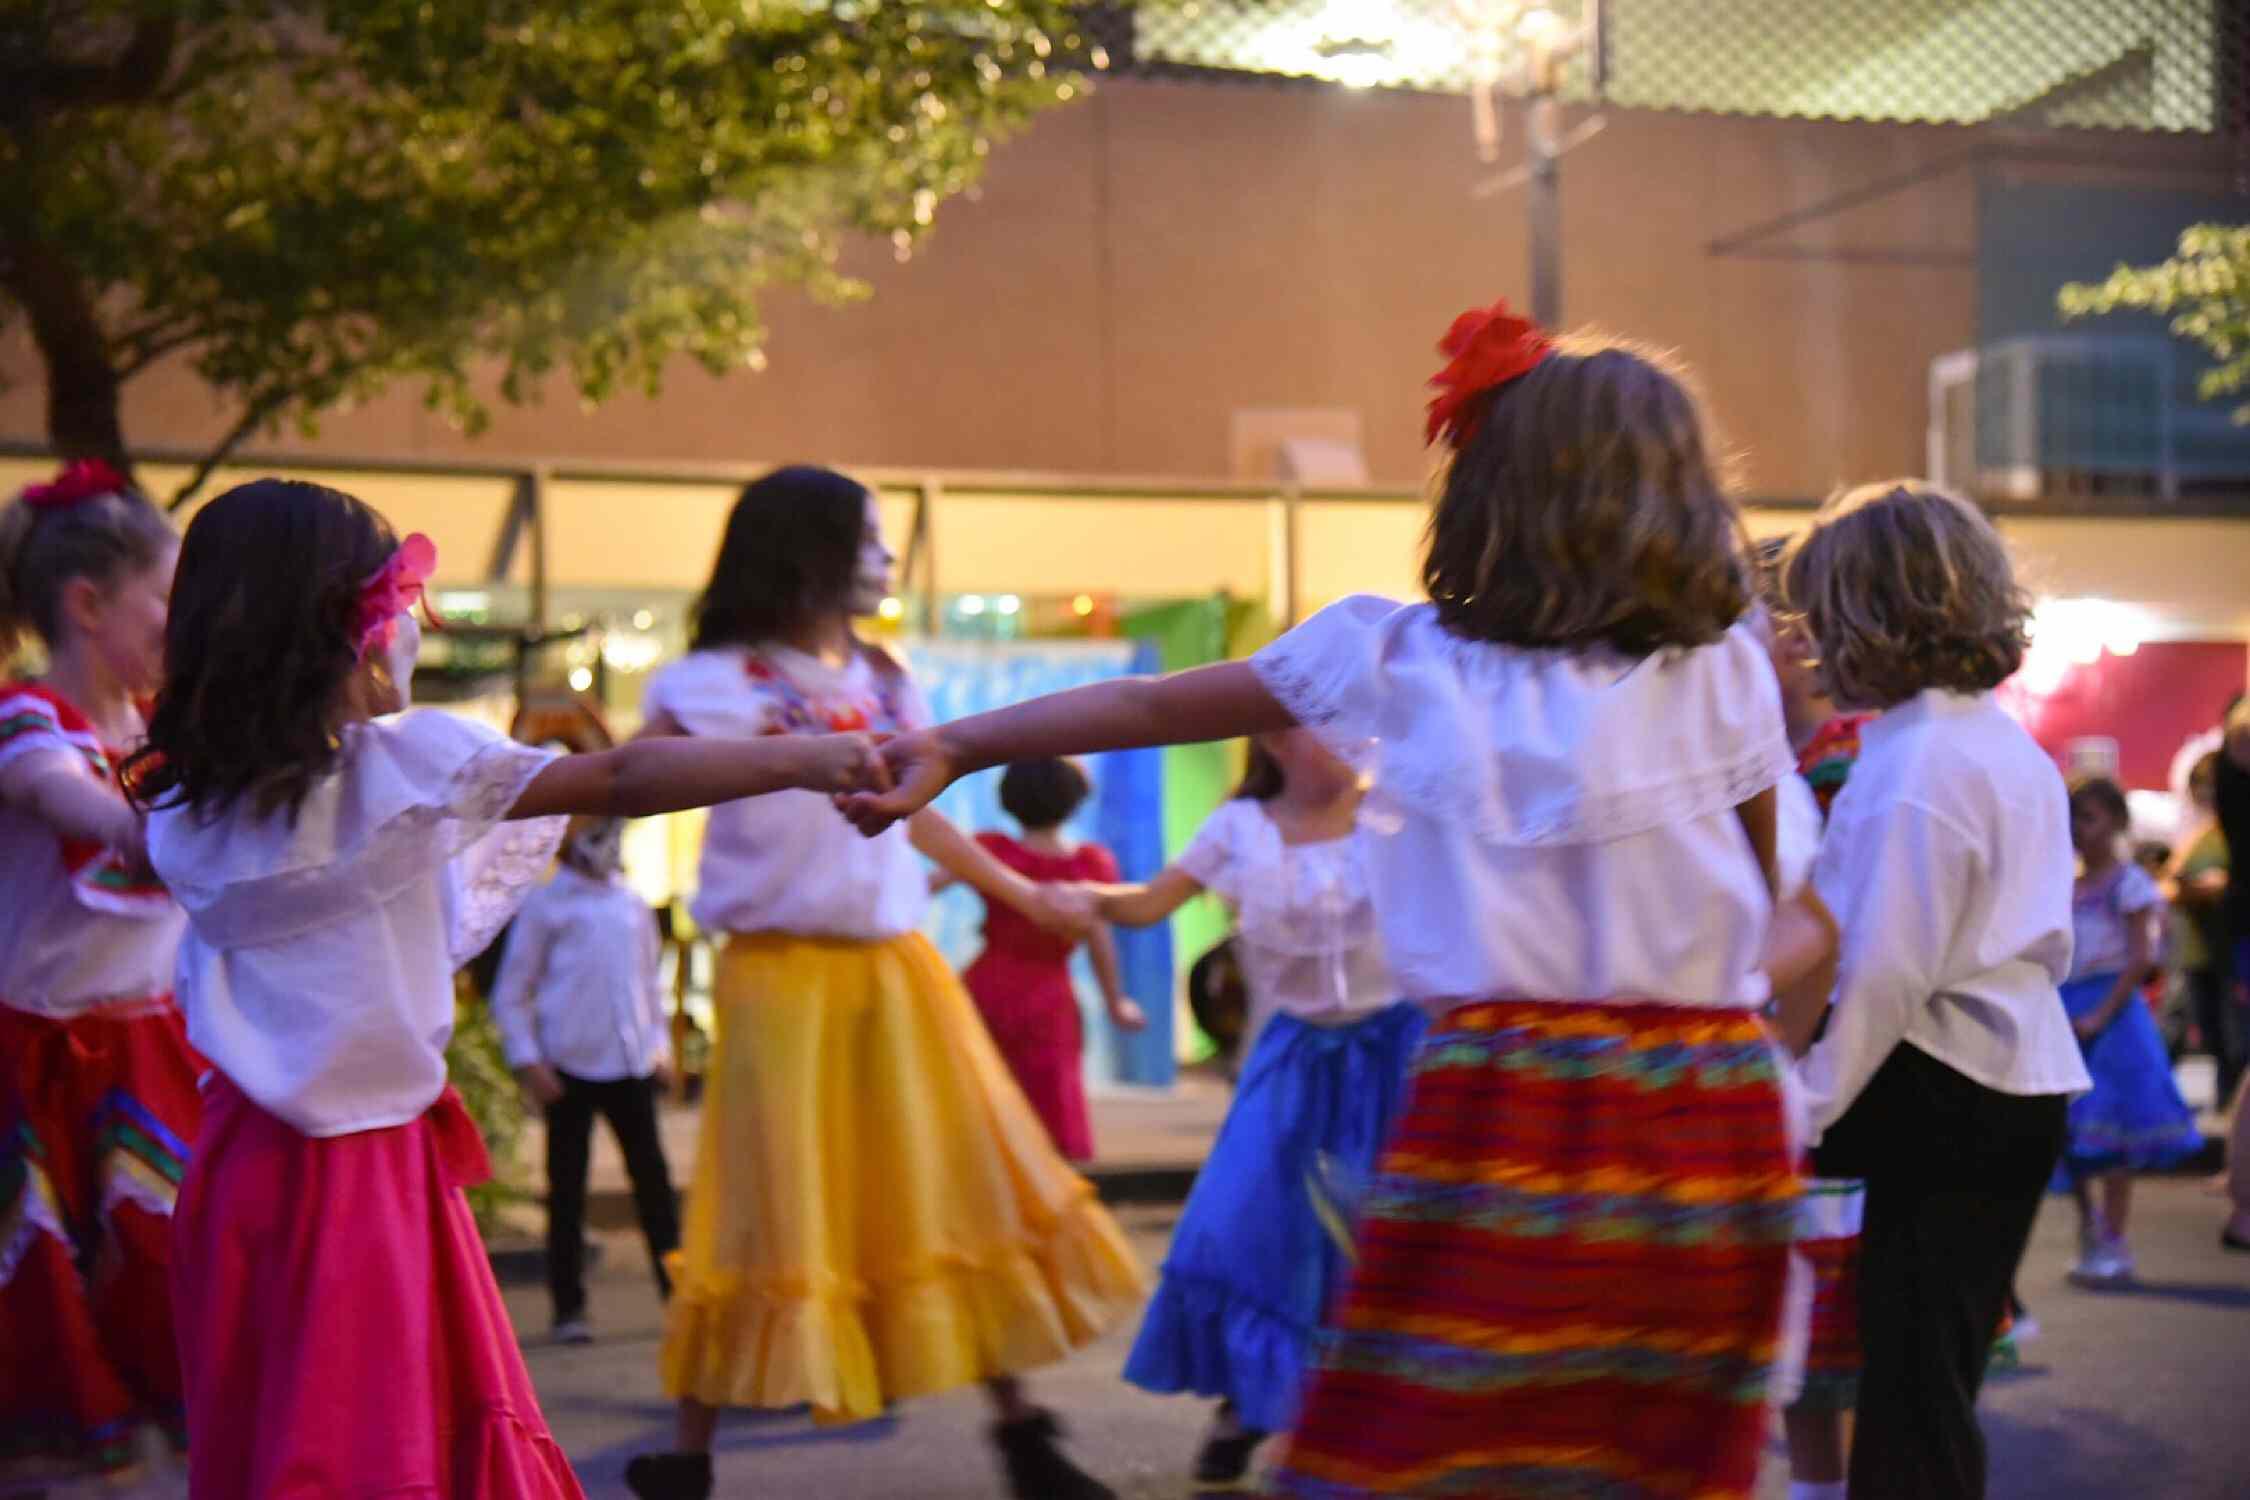 School aged kids performing publicly in downtown Phoenix for Dia de Los Muertos